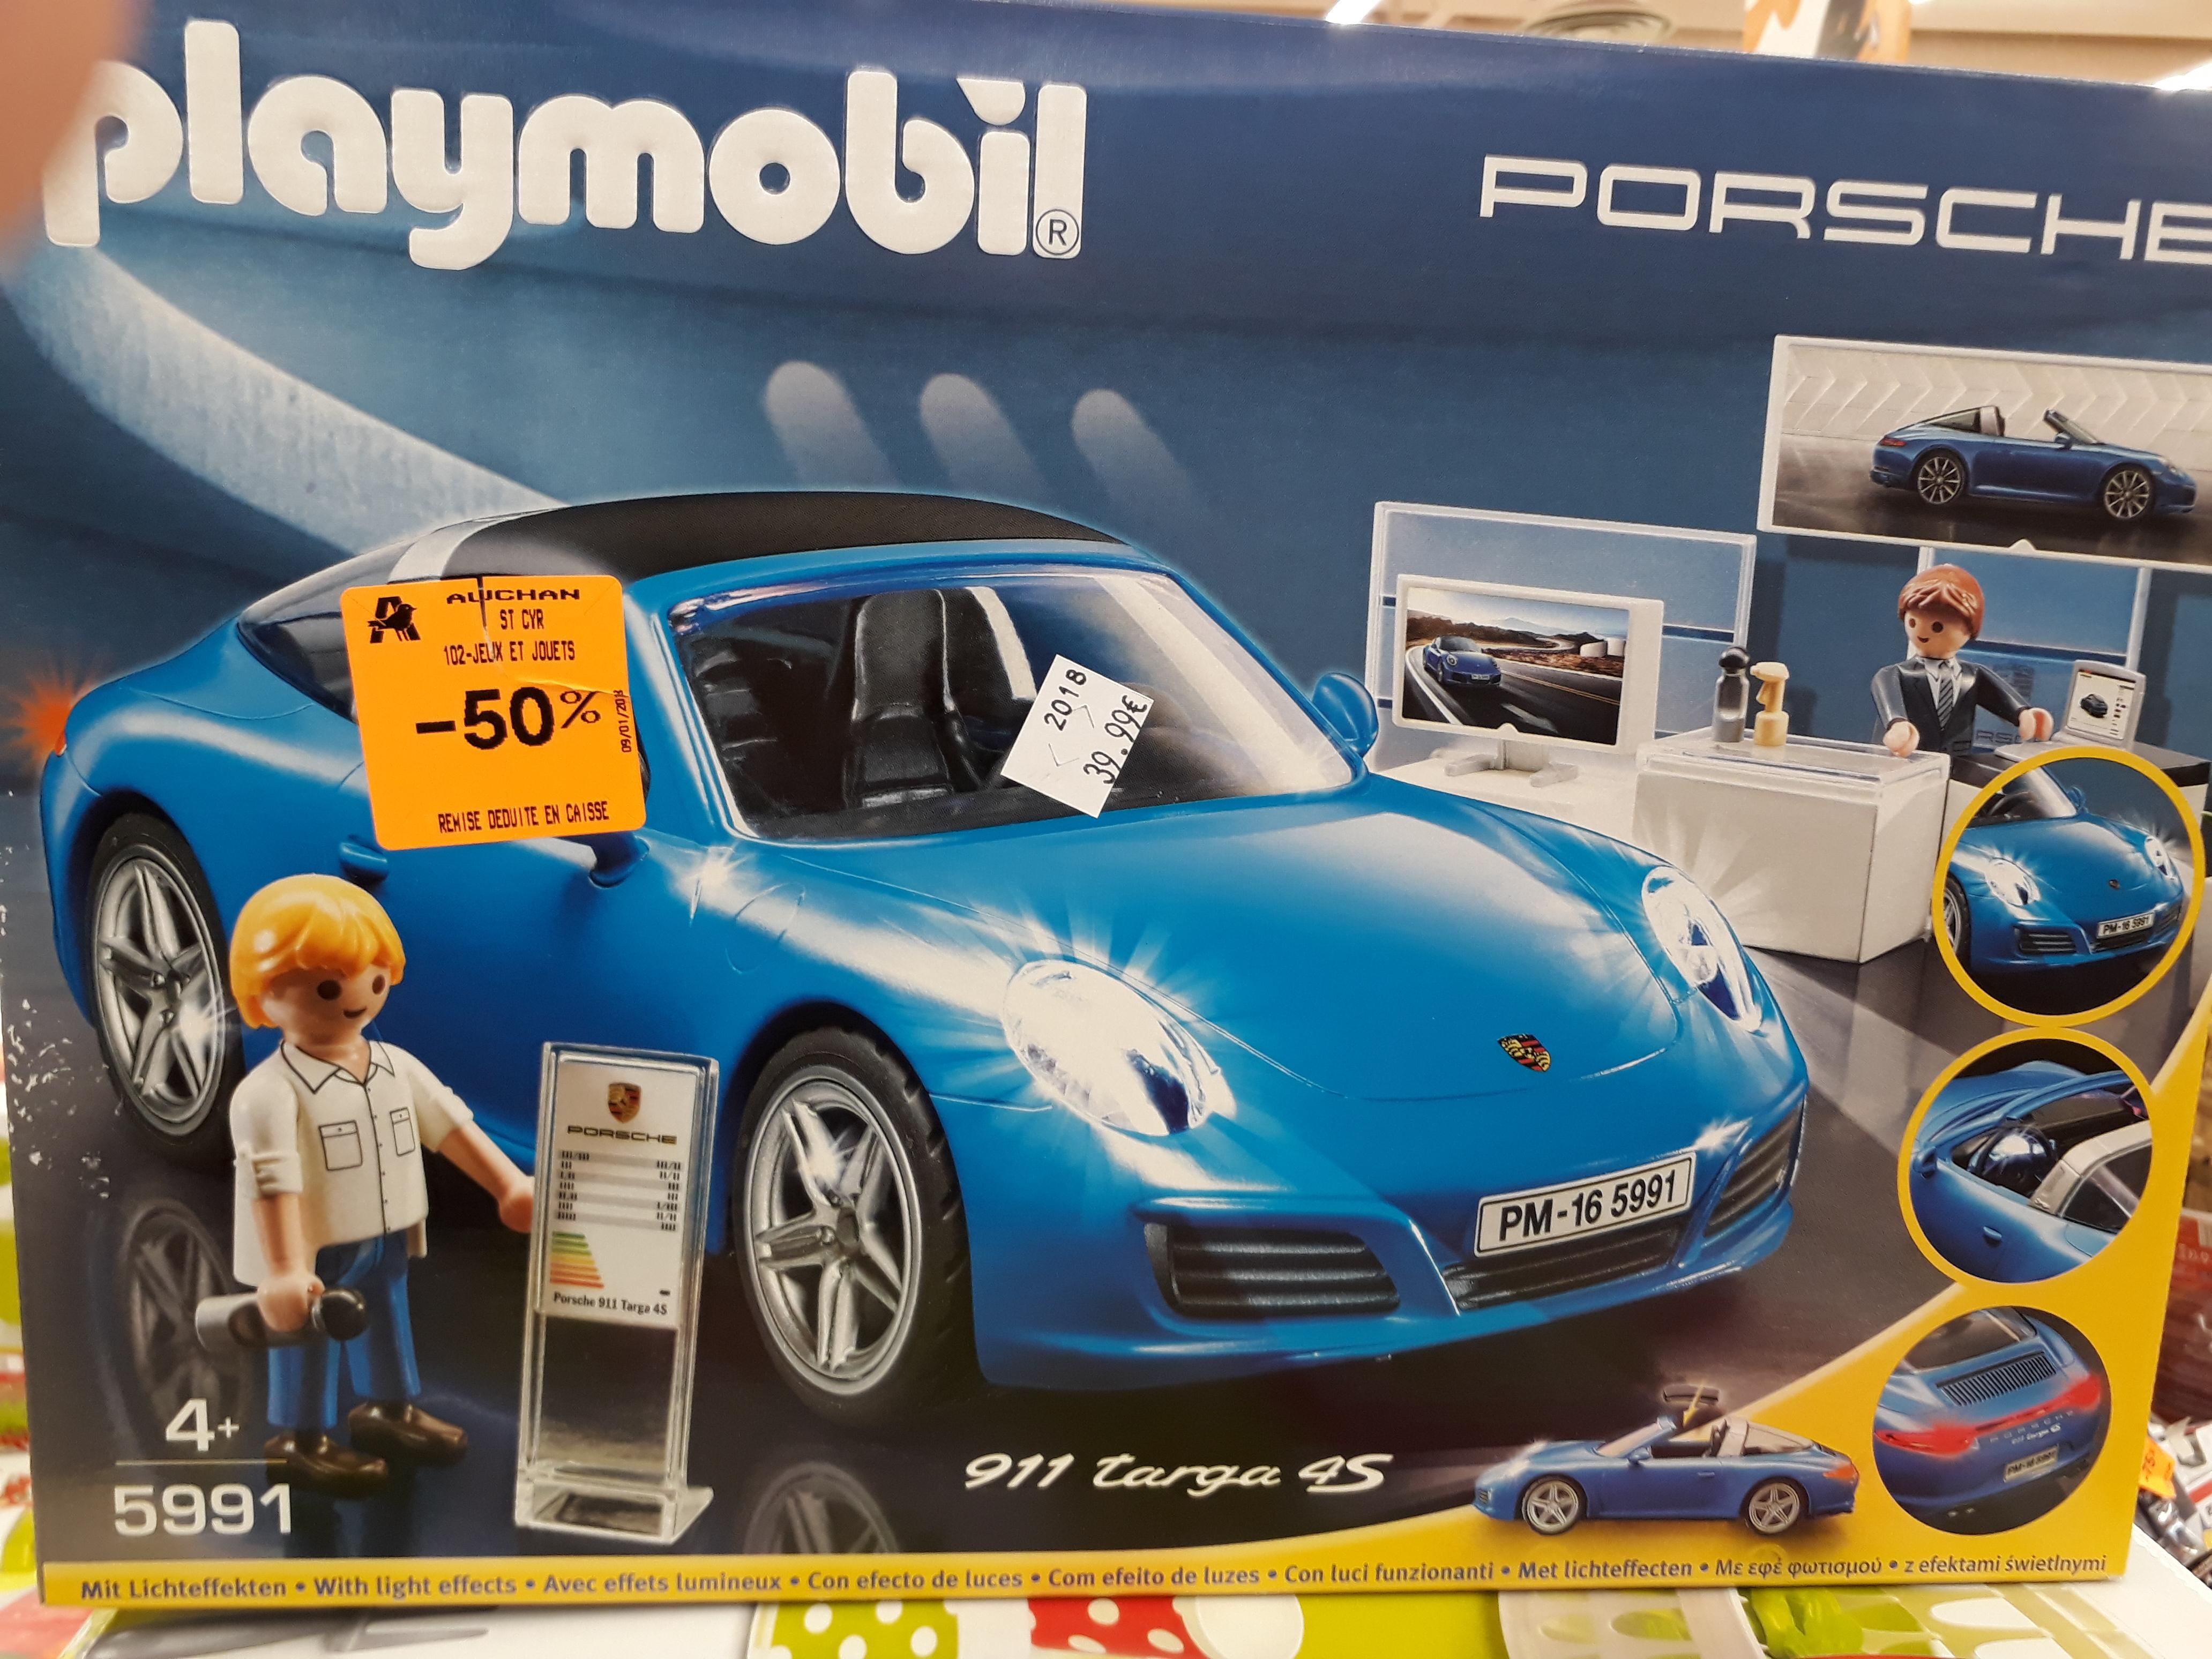 Playmobil Porsche 911 Targa 4S (5991) - Auchan Saint-Cyr (37)